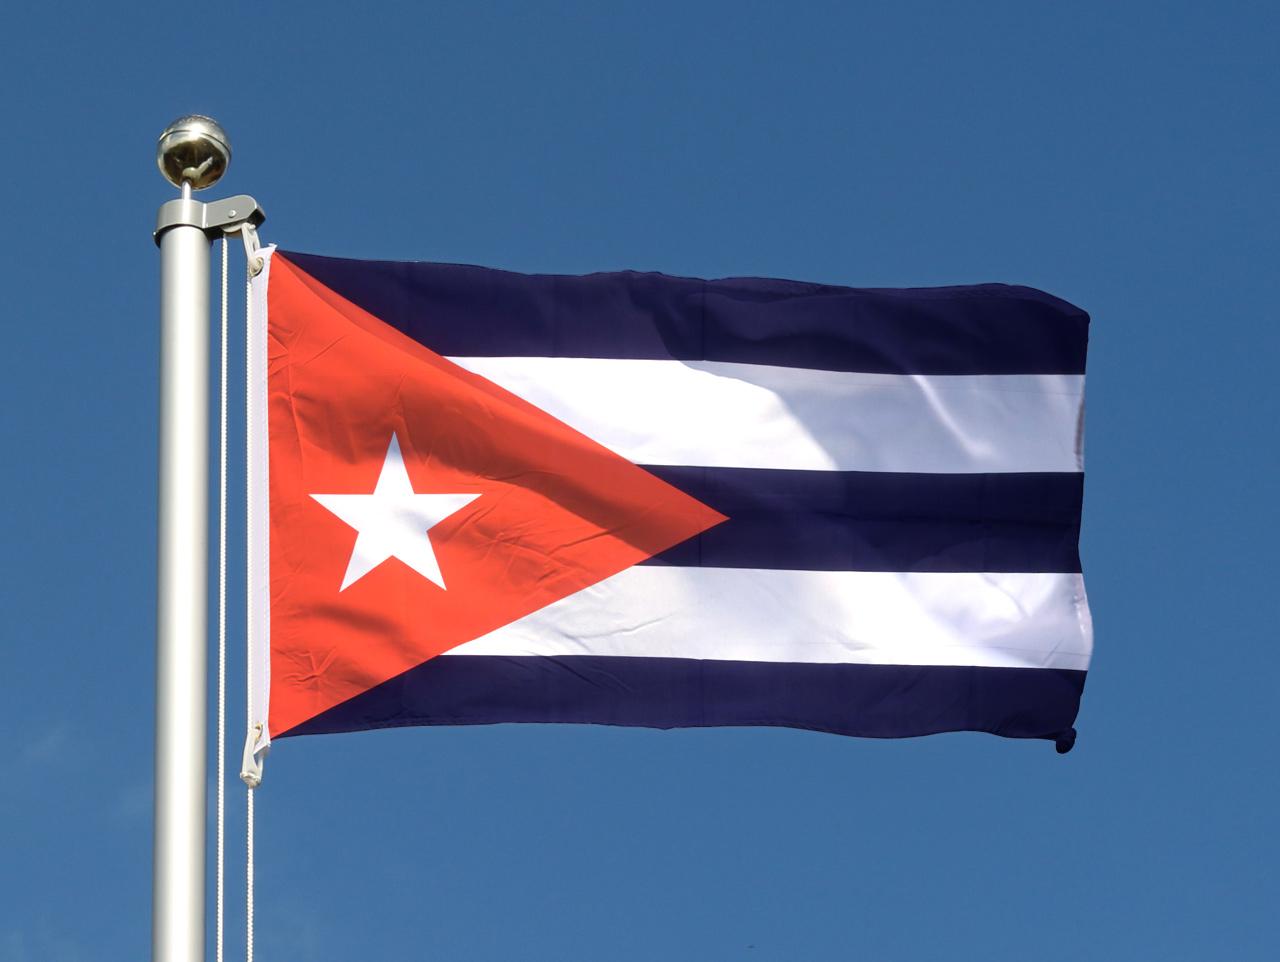 Kuba flagge 60 x 90 cm flaggenplatz Kuba dekoration